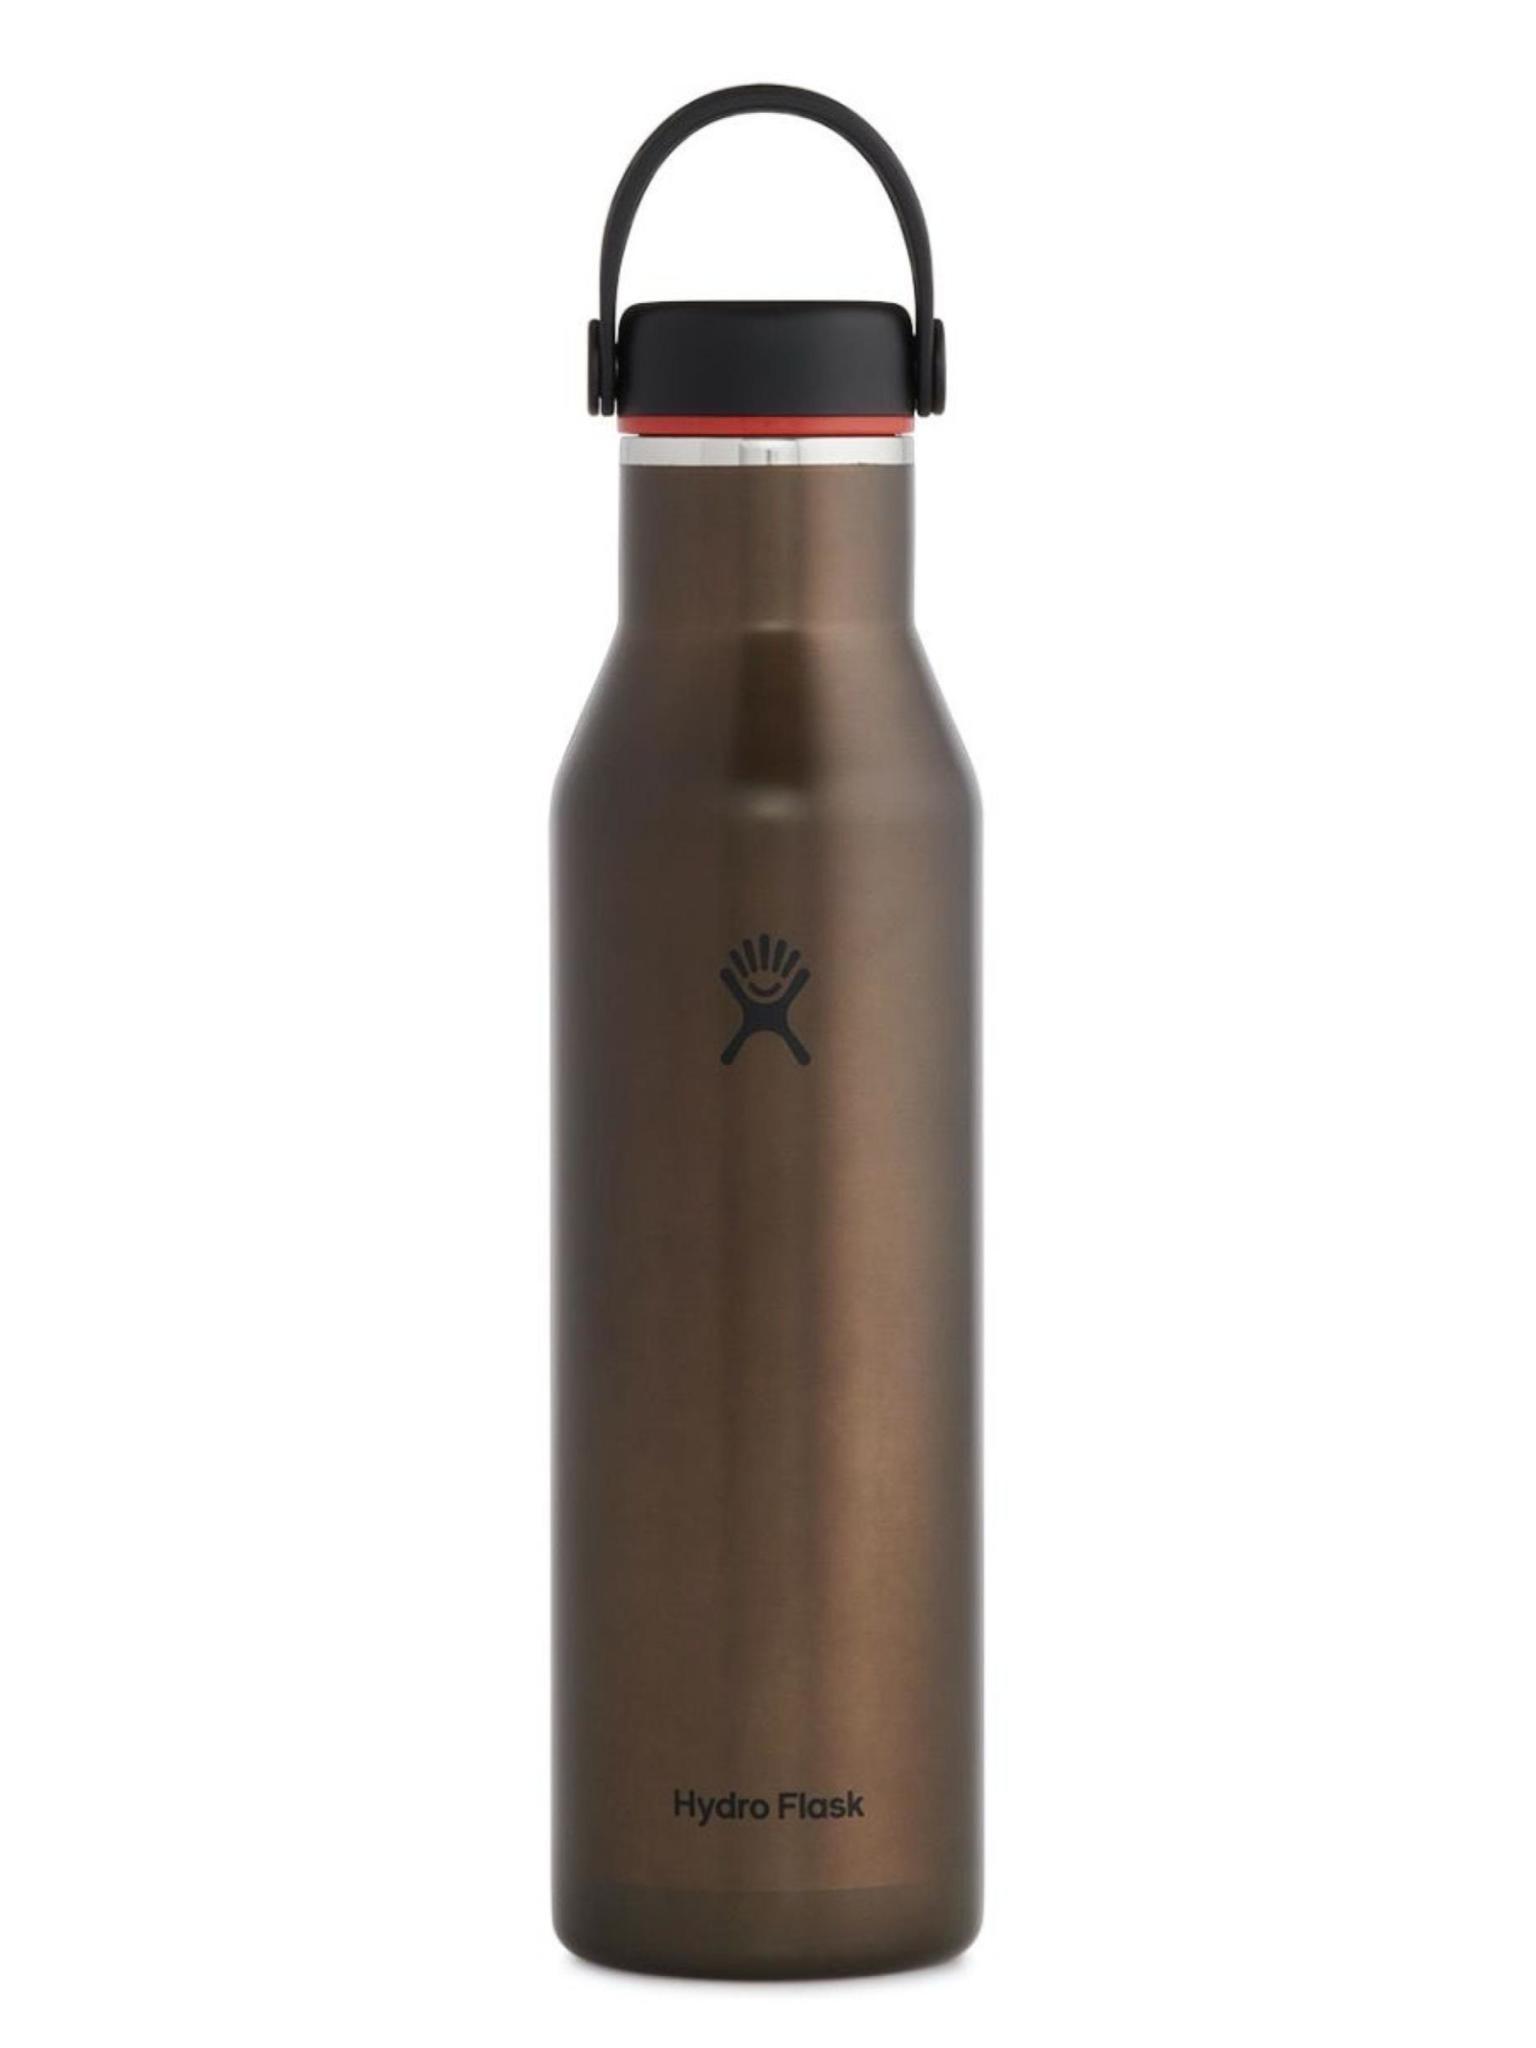 Hydro Flask 21 Oz Lightweight Waterbottle with Flex Cap